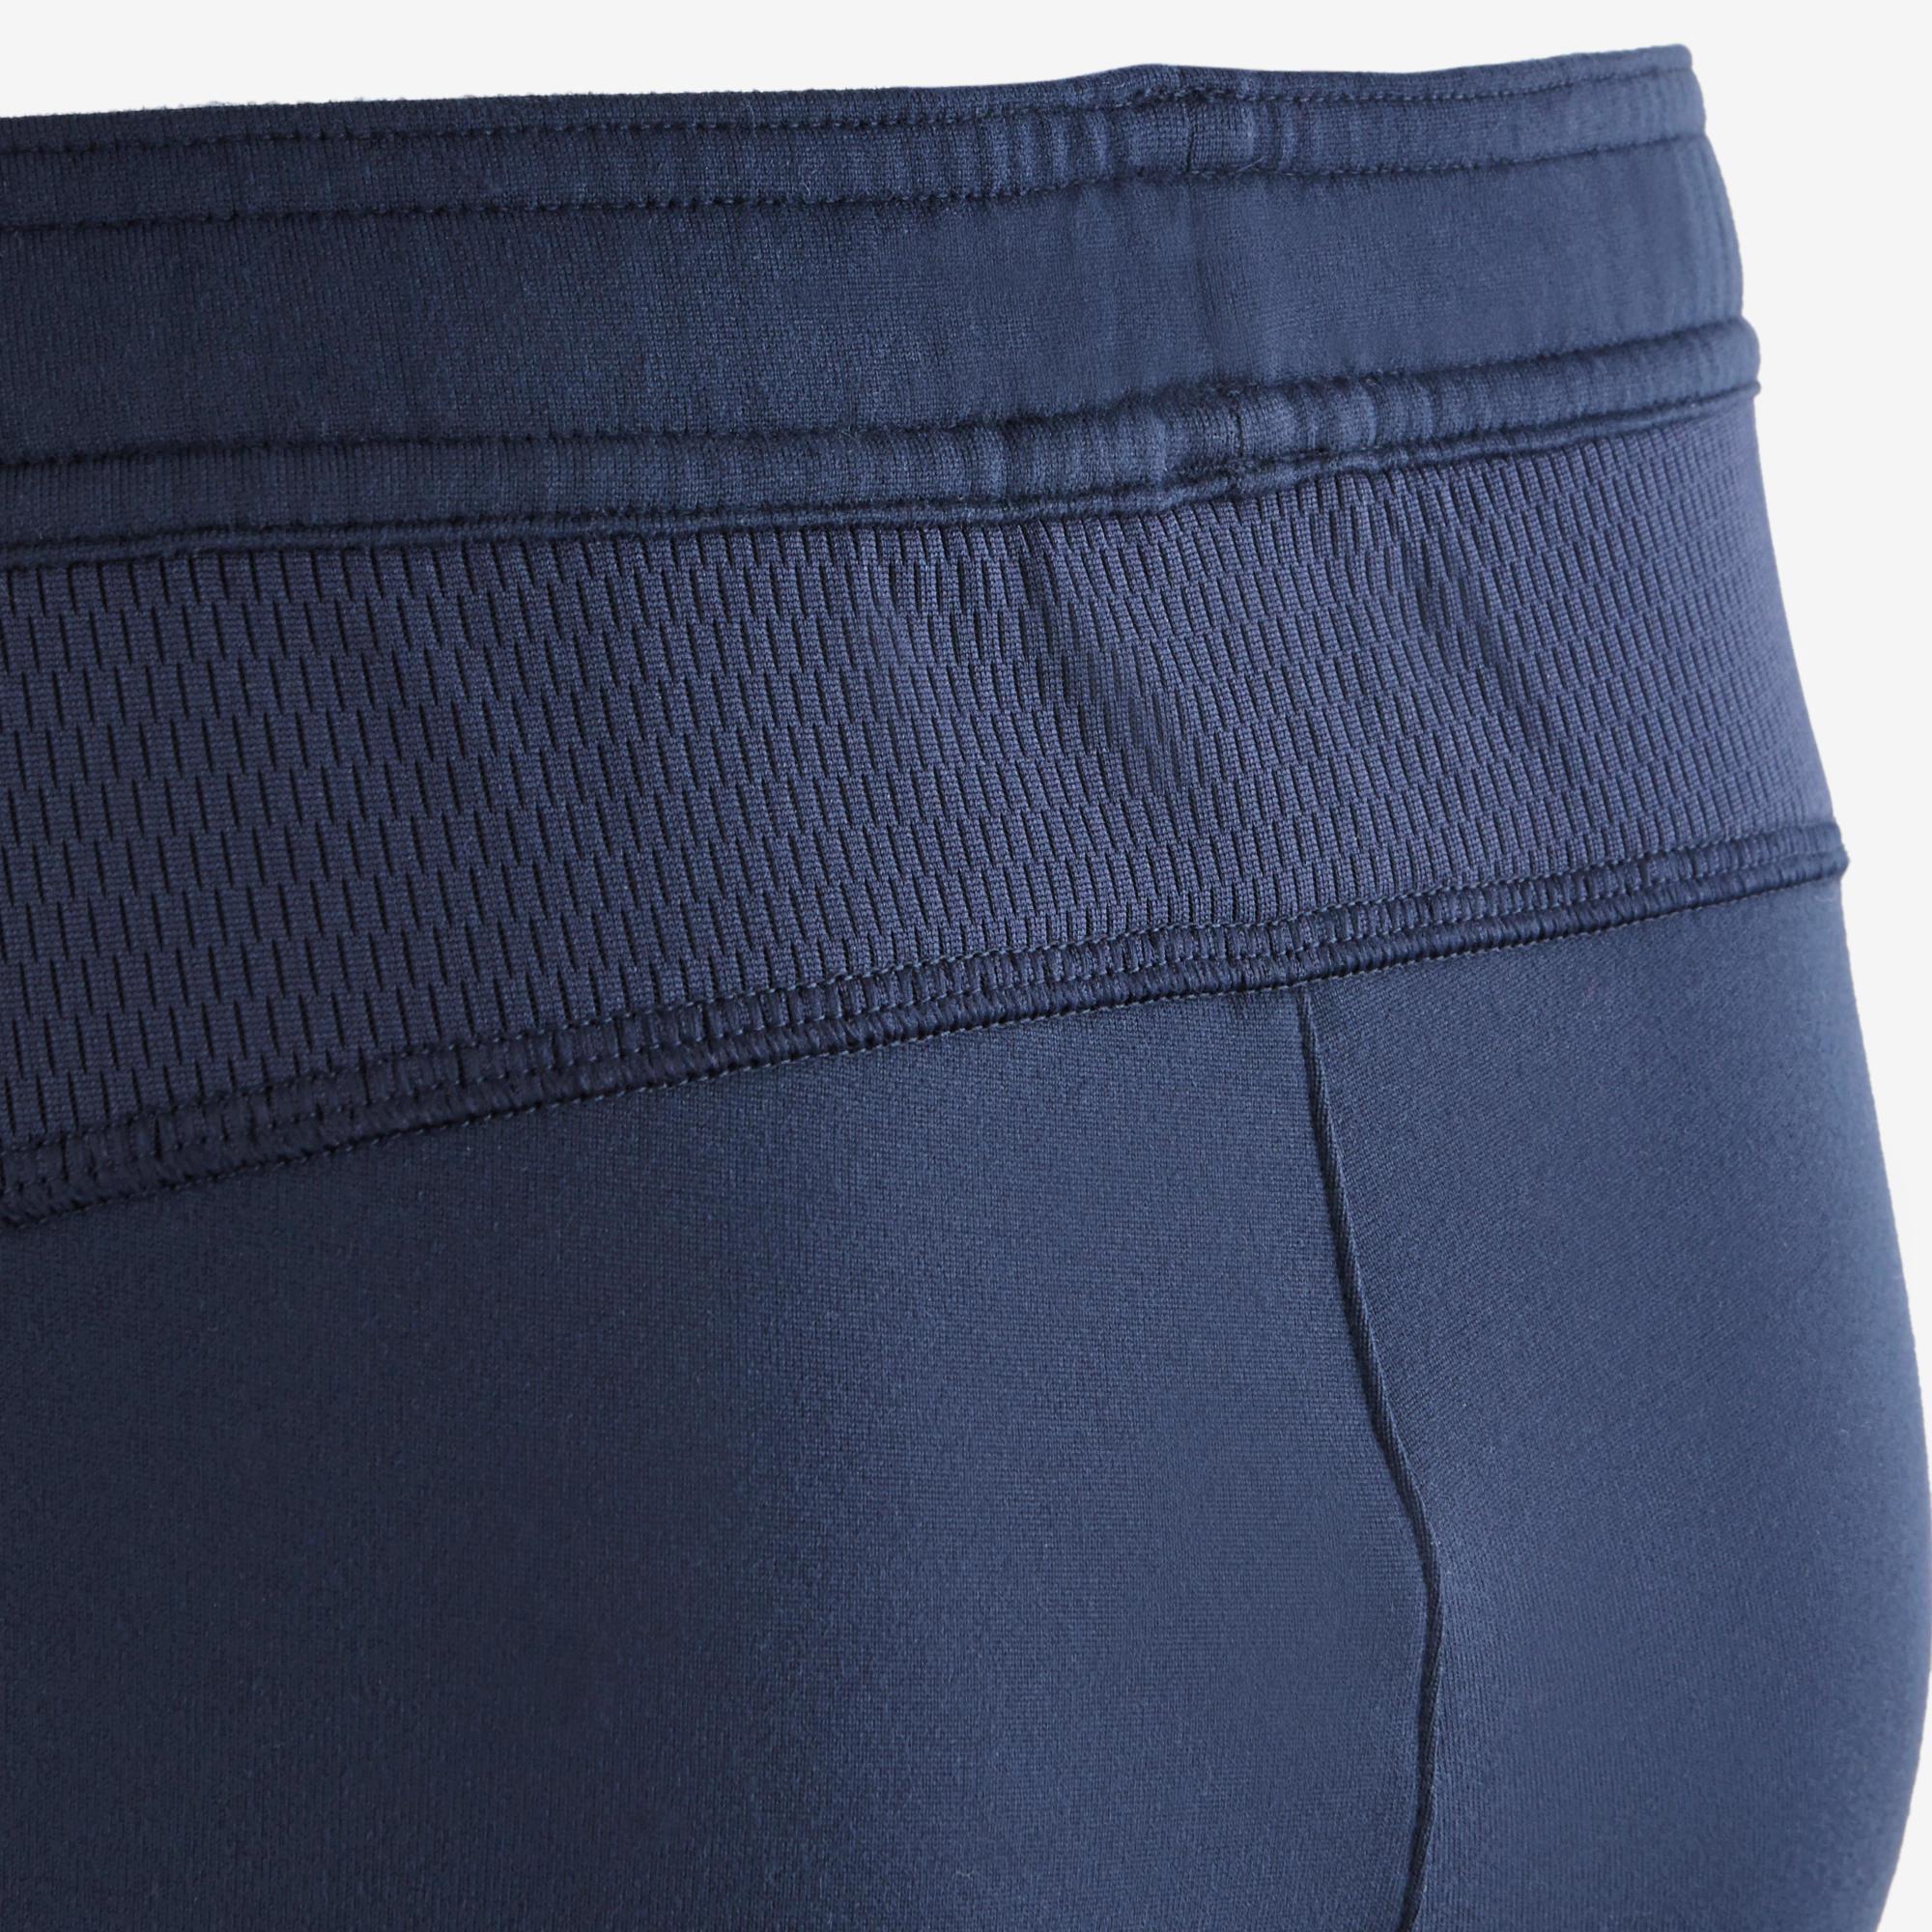 S900 Boys' Gym Bottoms - Navy Blue